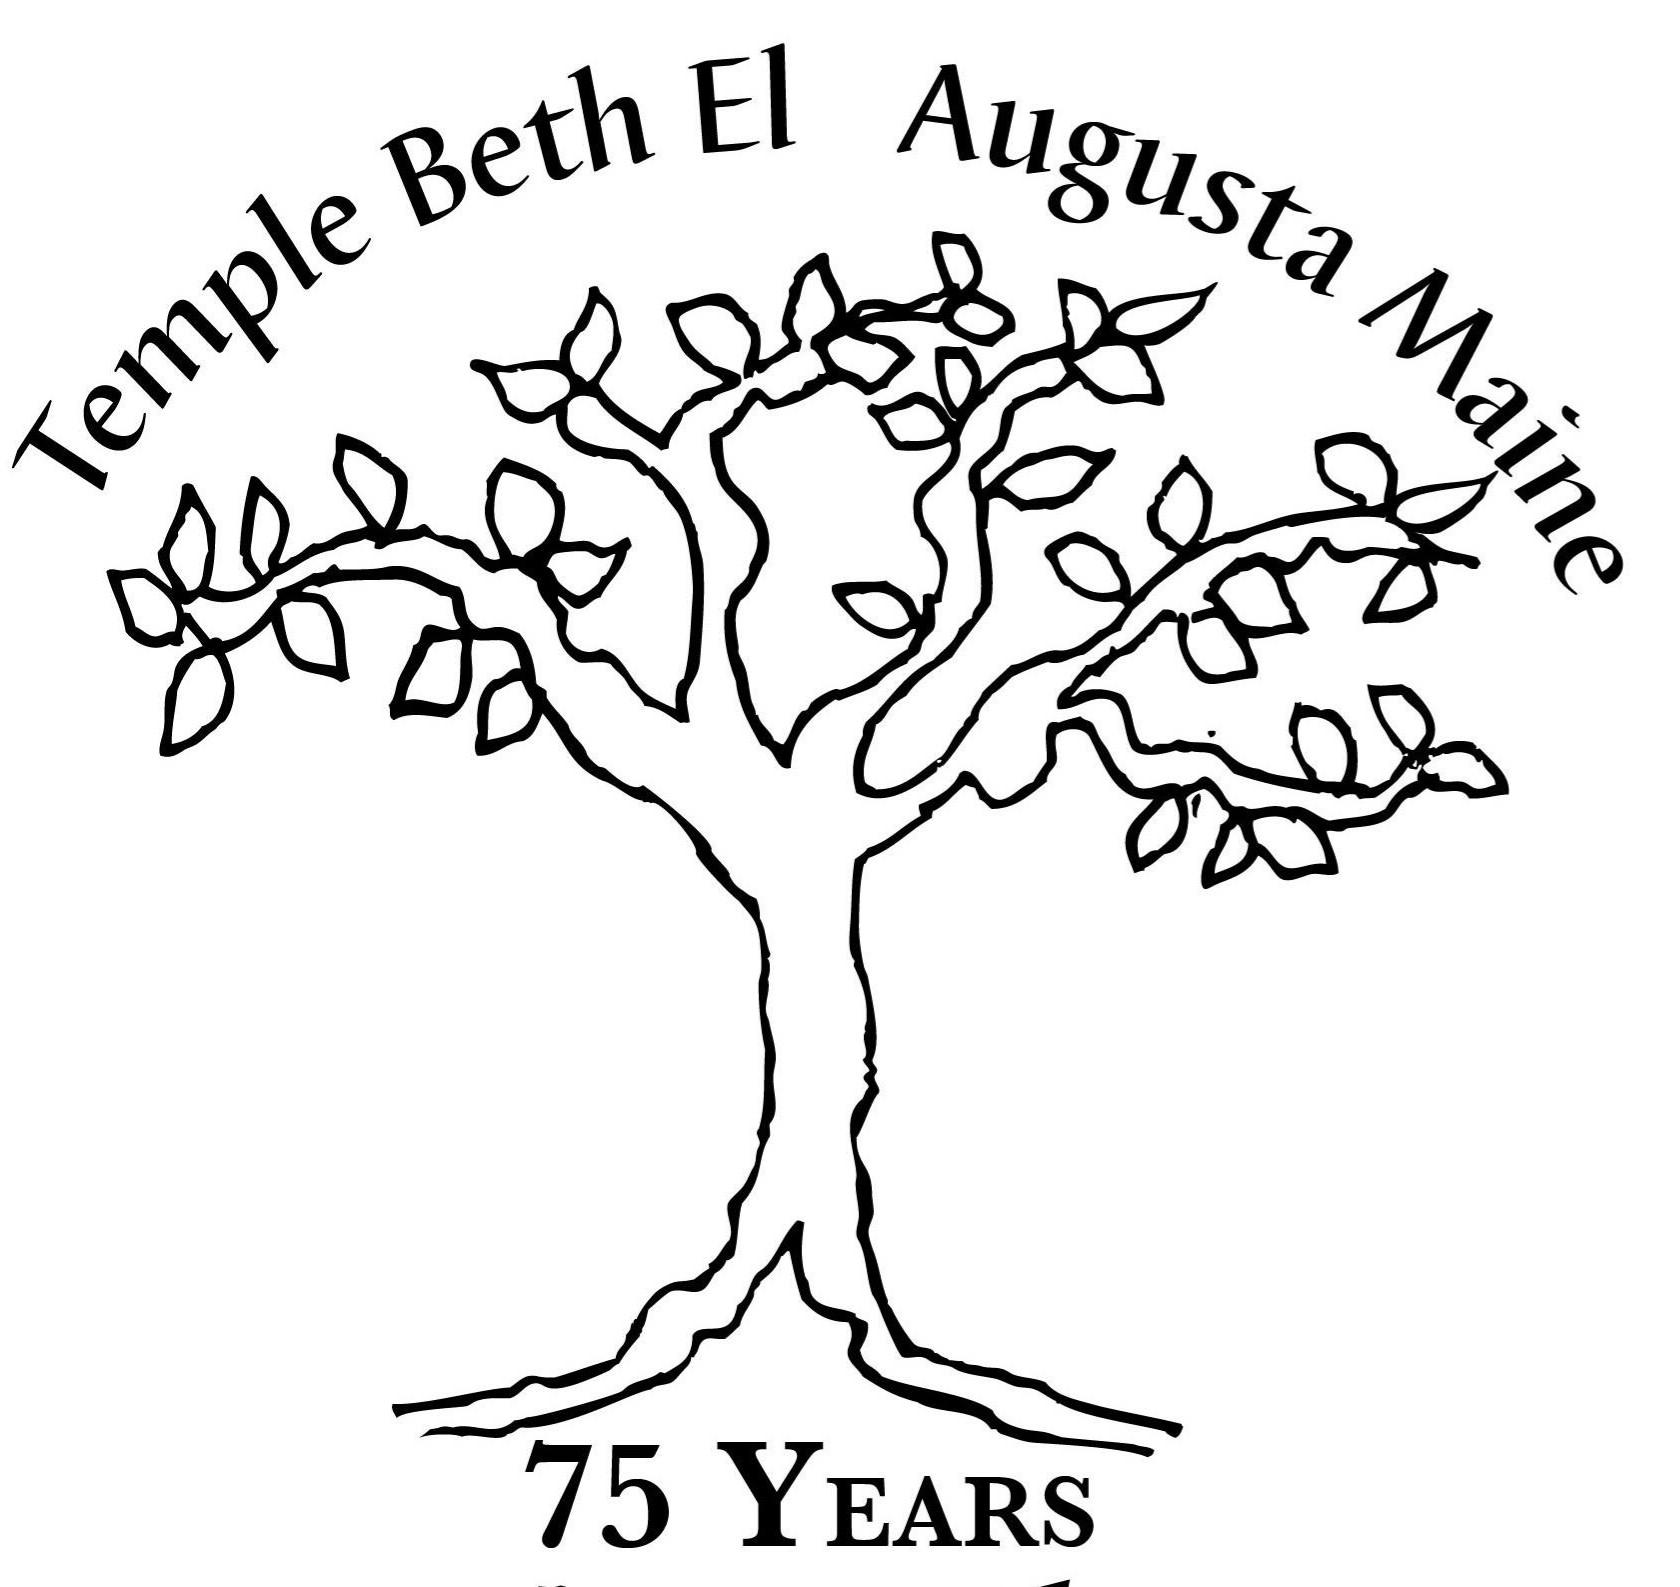 Temple Beth El Augusta, Maine